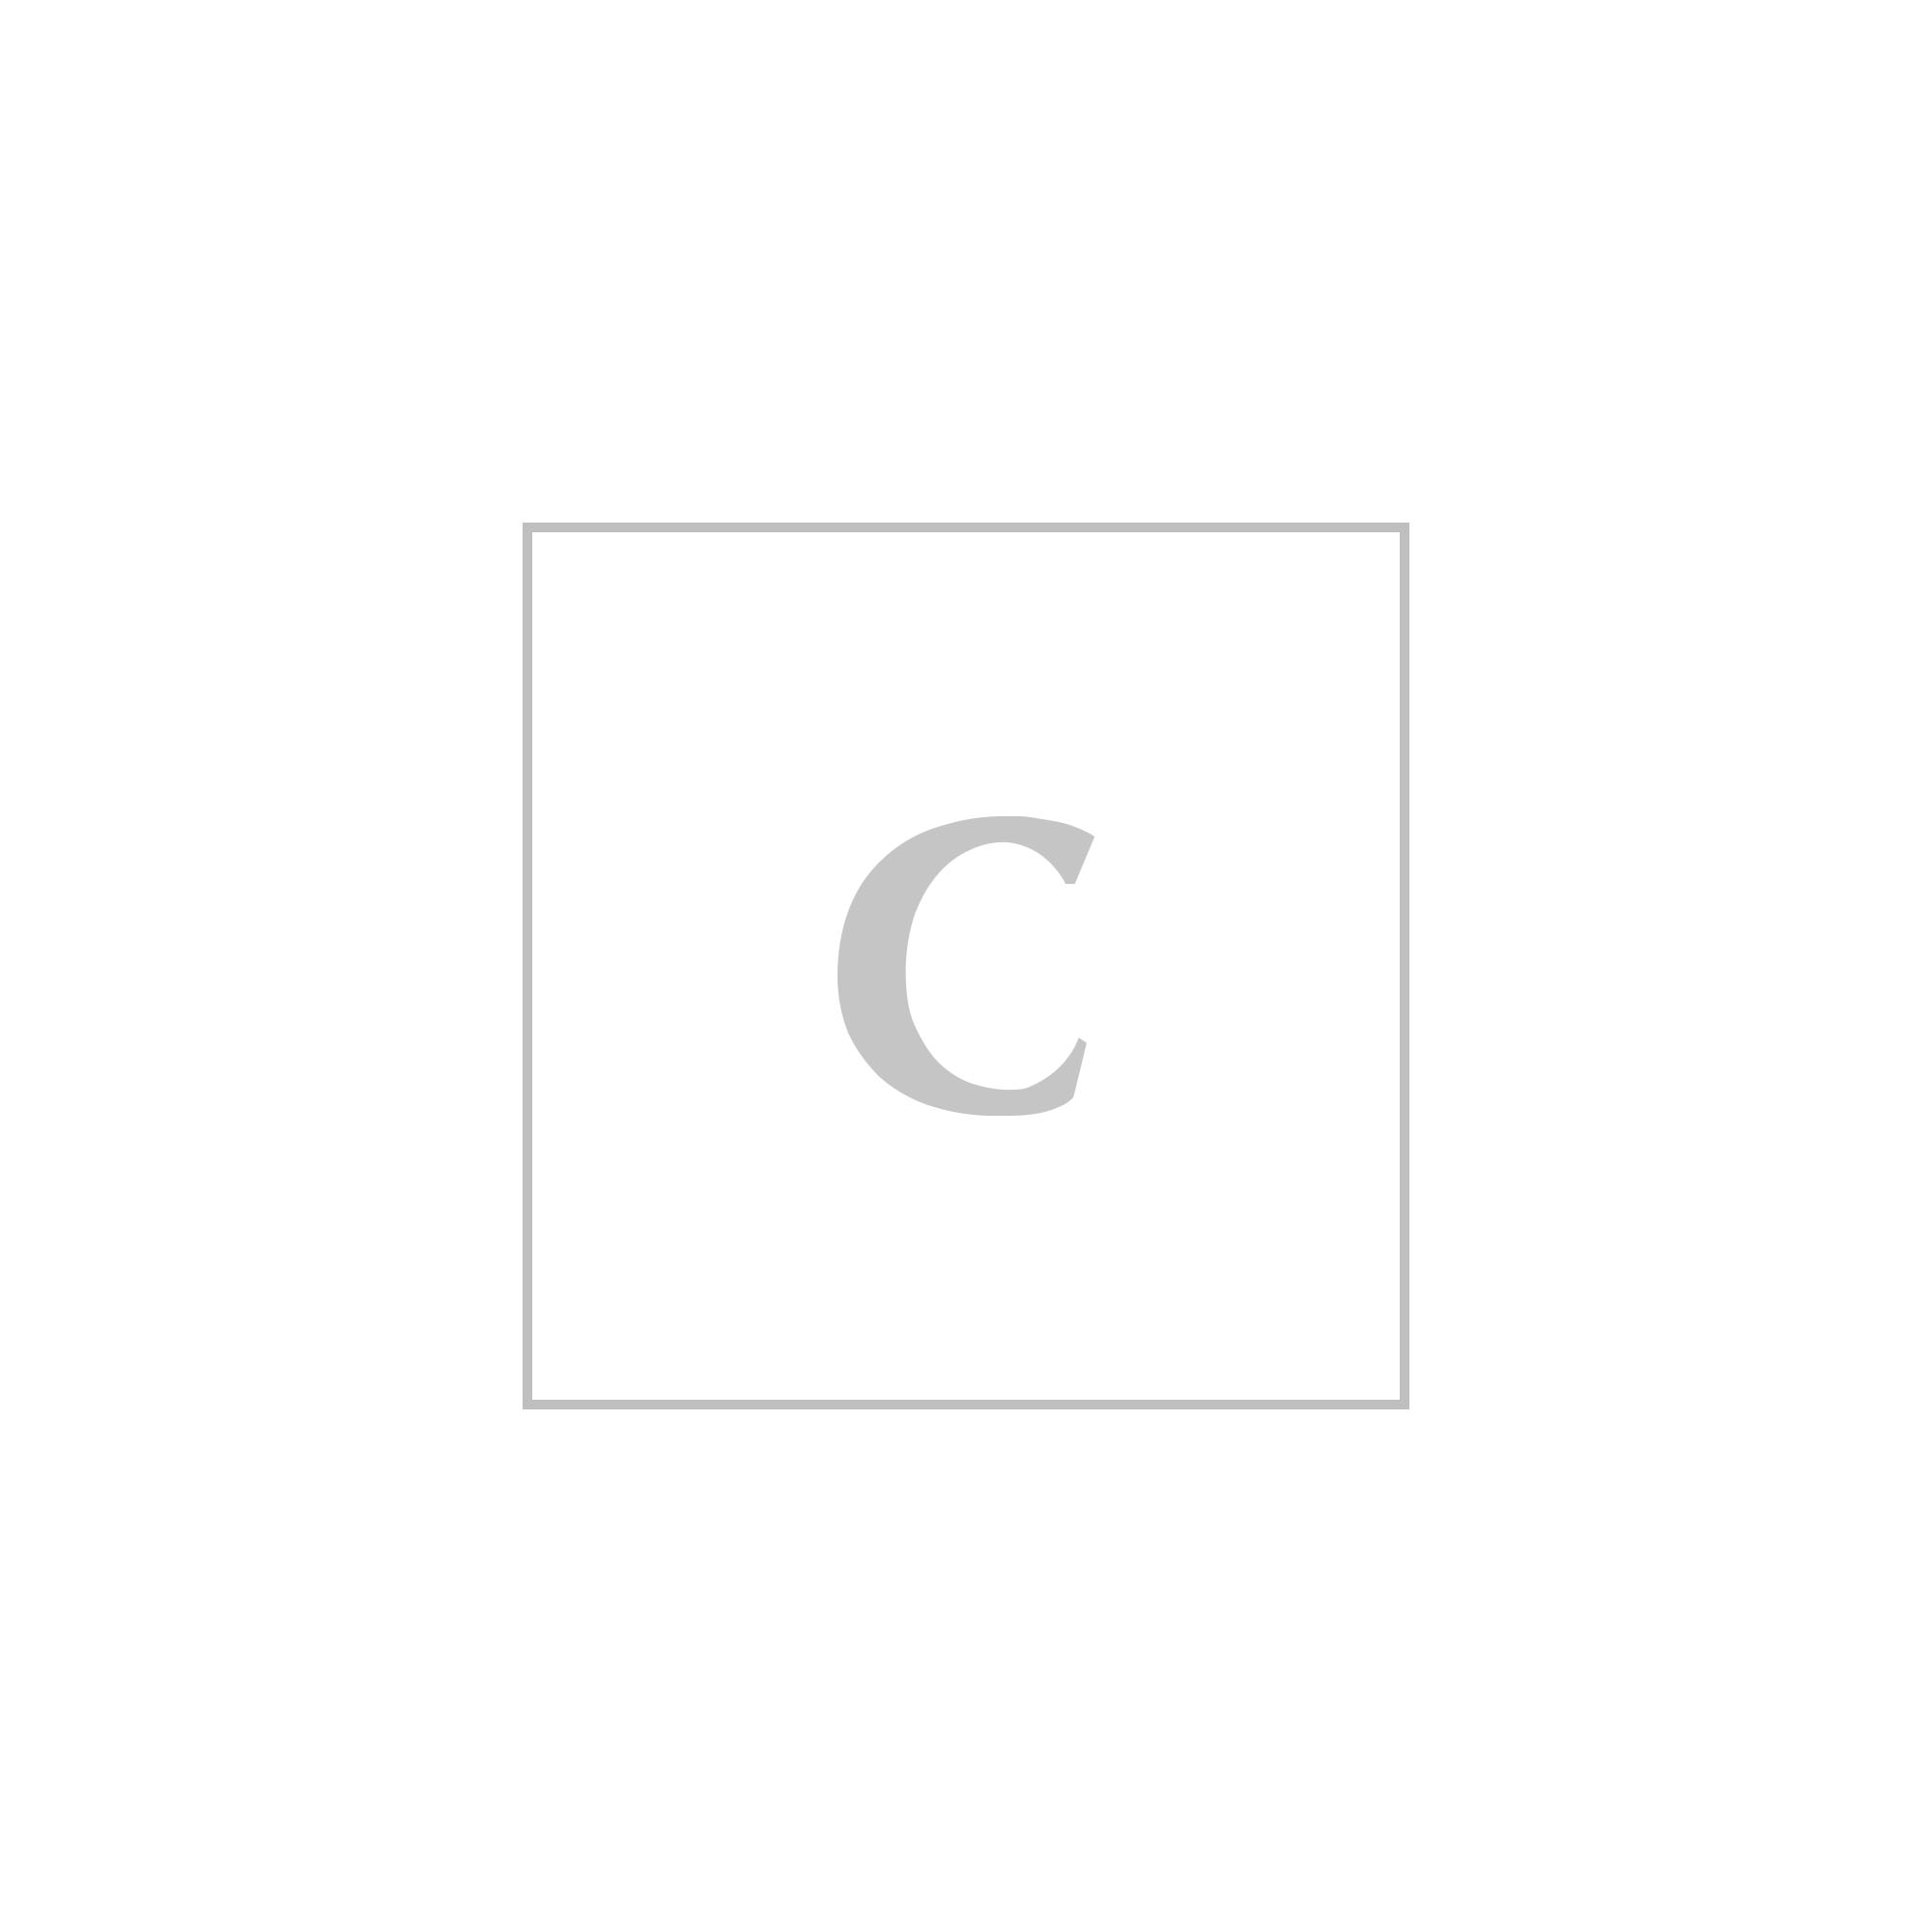 Saint laurent borsa large kate monogram